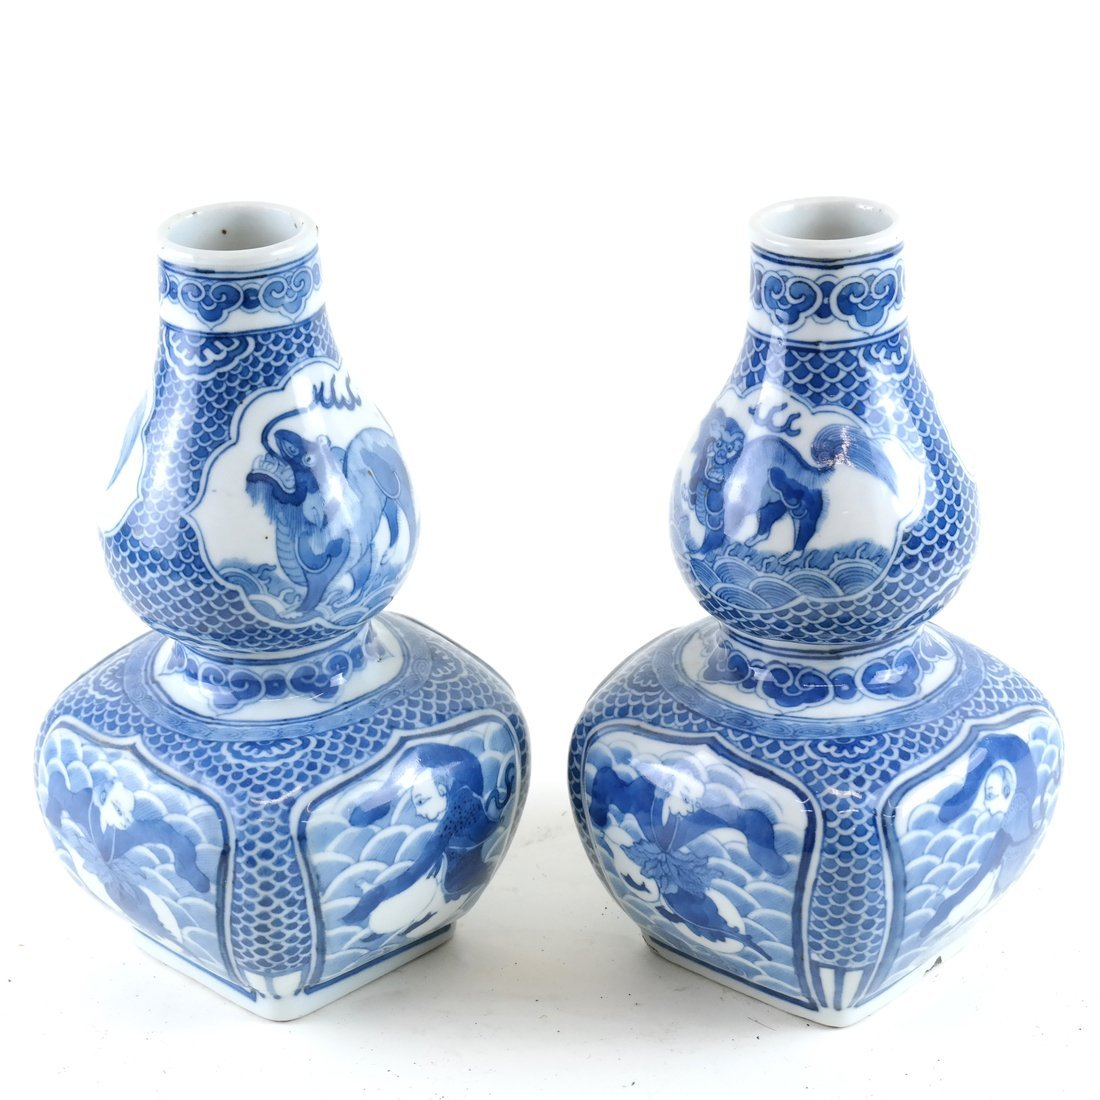 Pair of Asian-Style Blue & White Vases